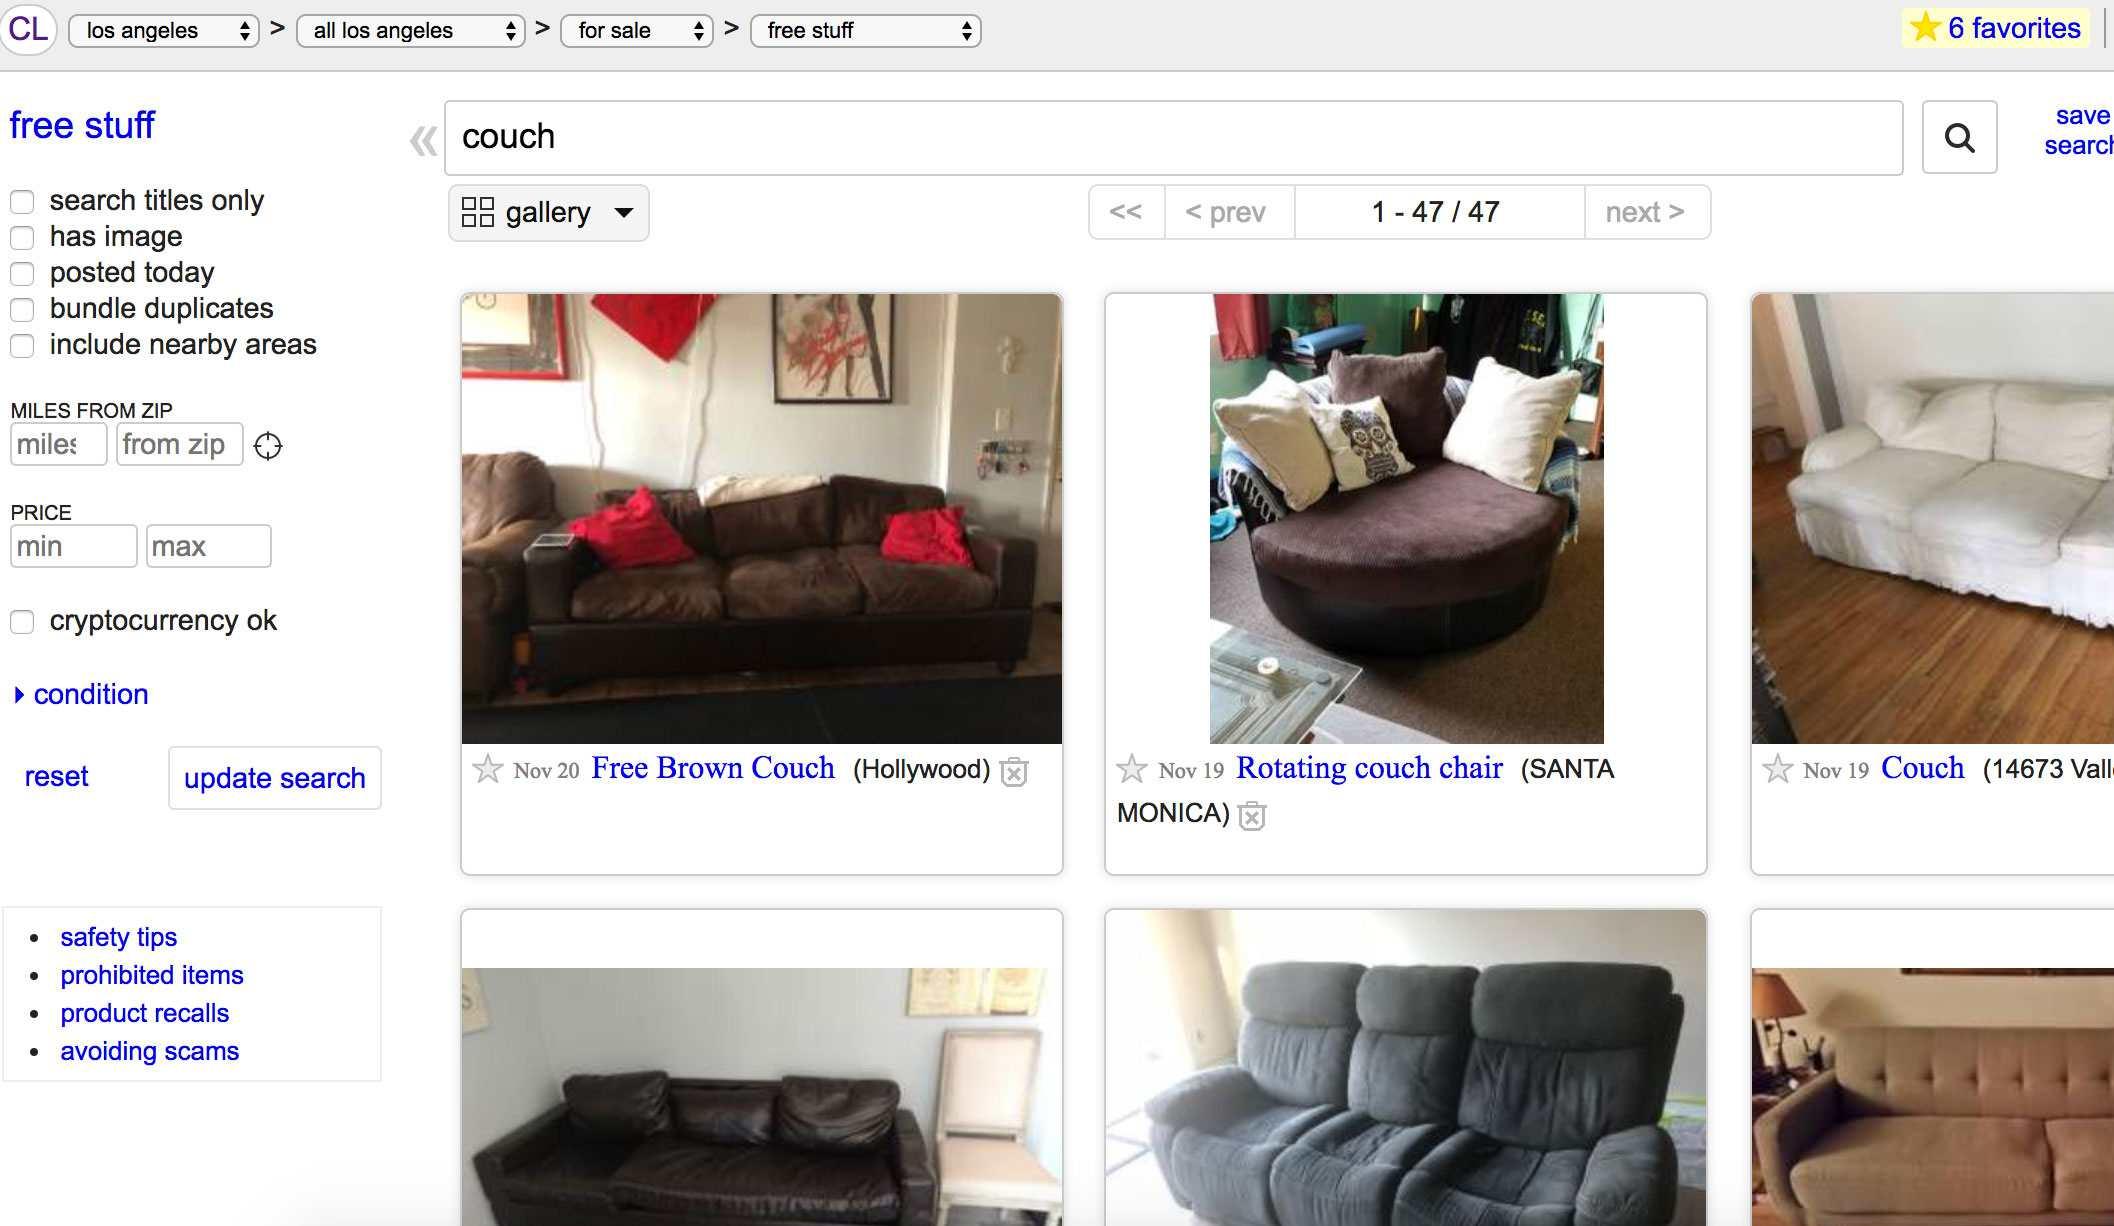 List of free items for sale on Craigslist